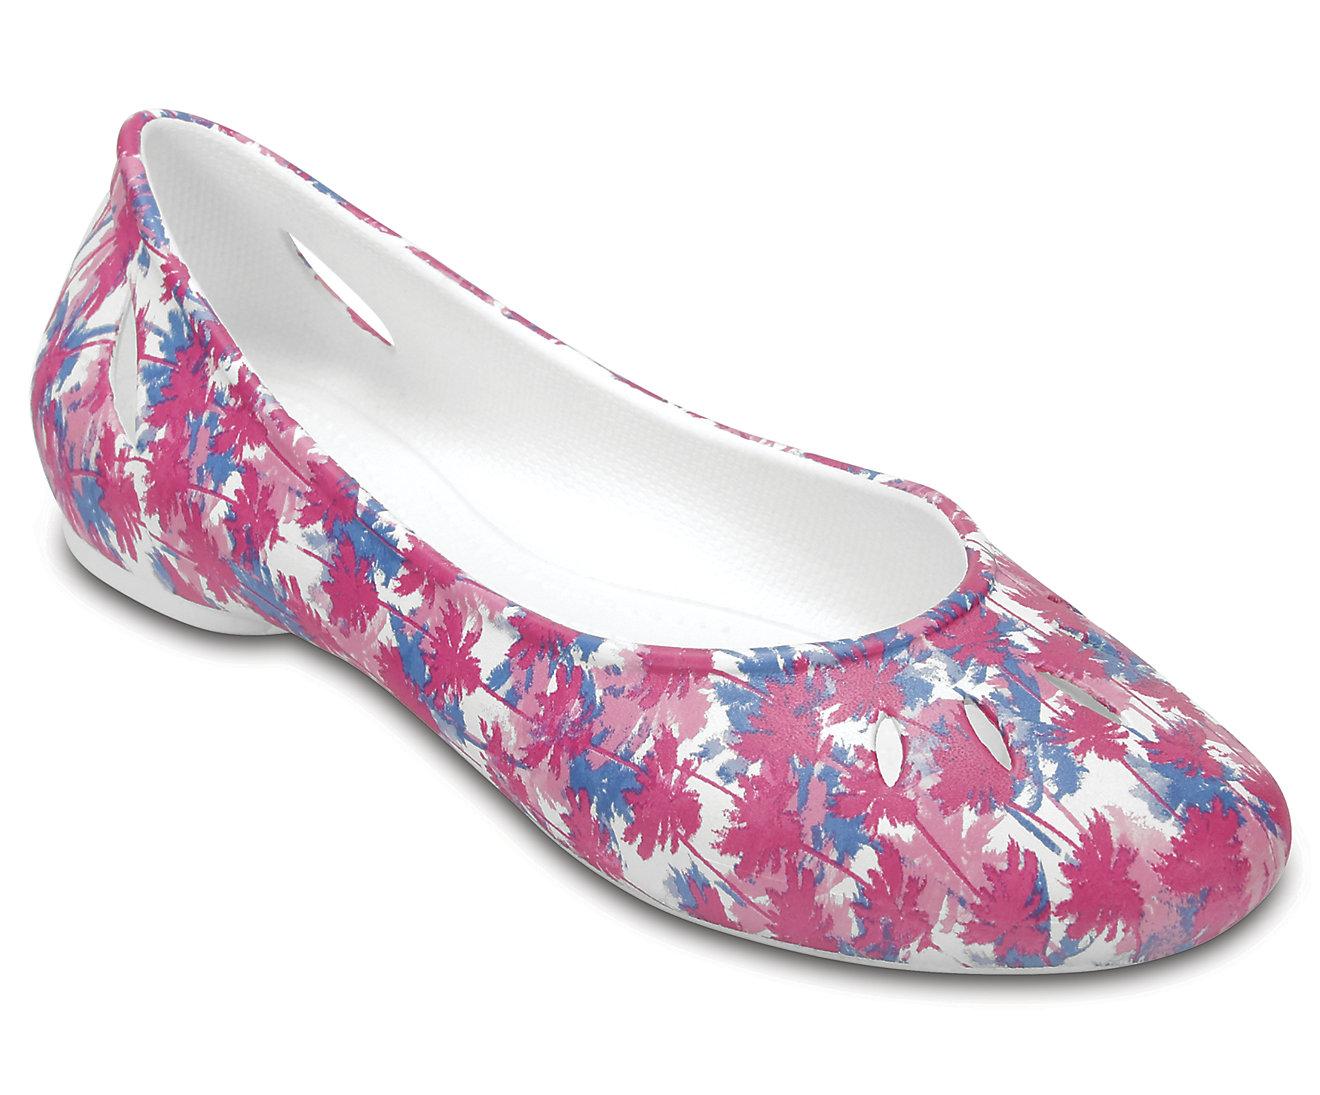 Women's Crocs Kelli Graphic Flats